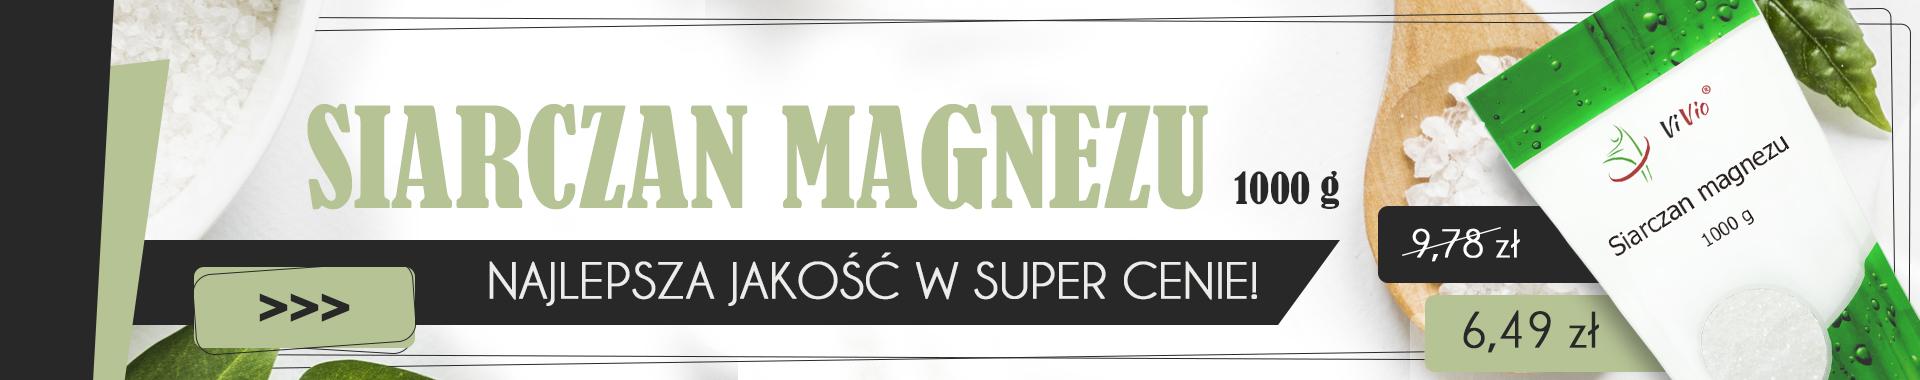 Siarczan magnezu 1000g